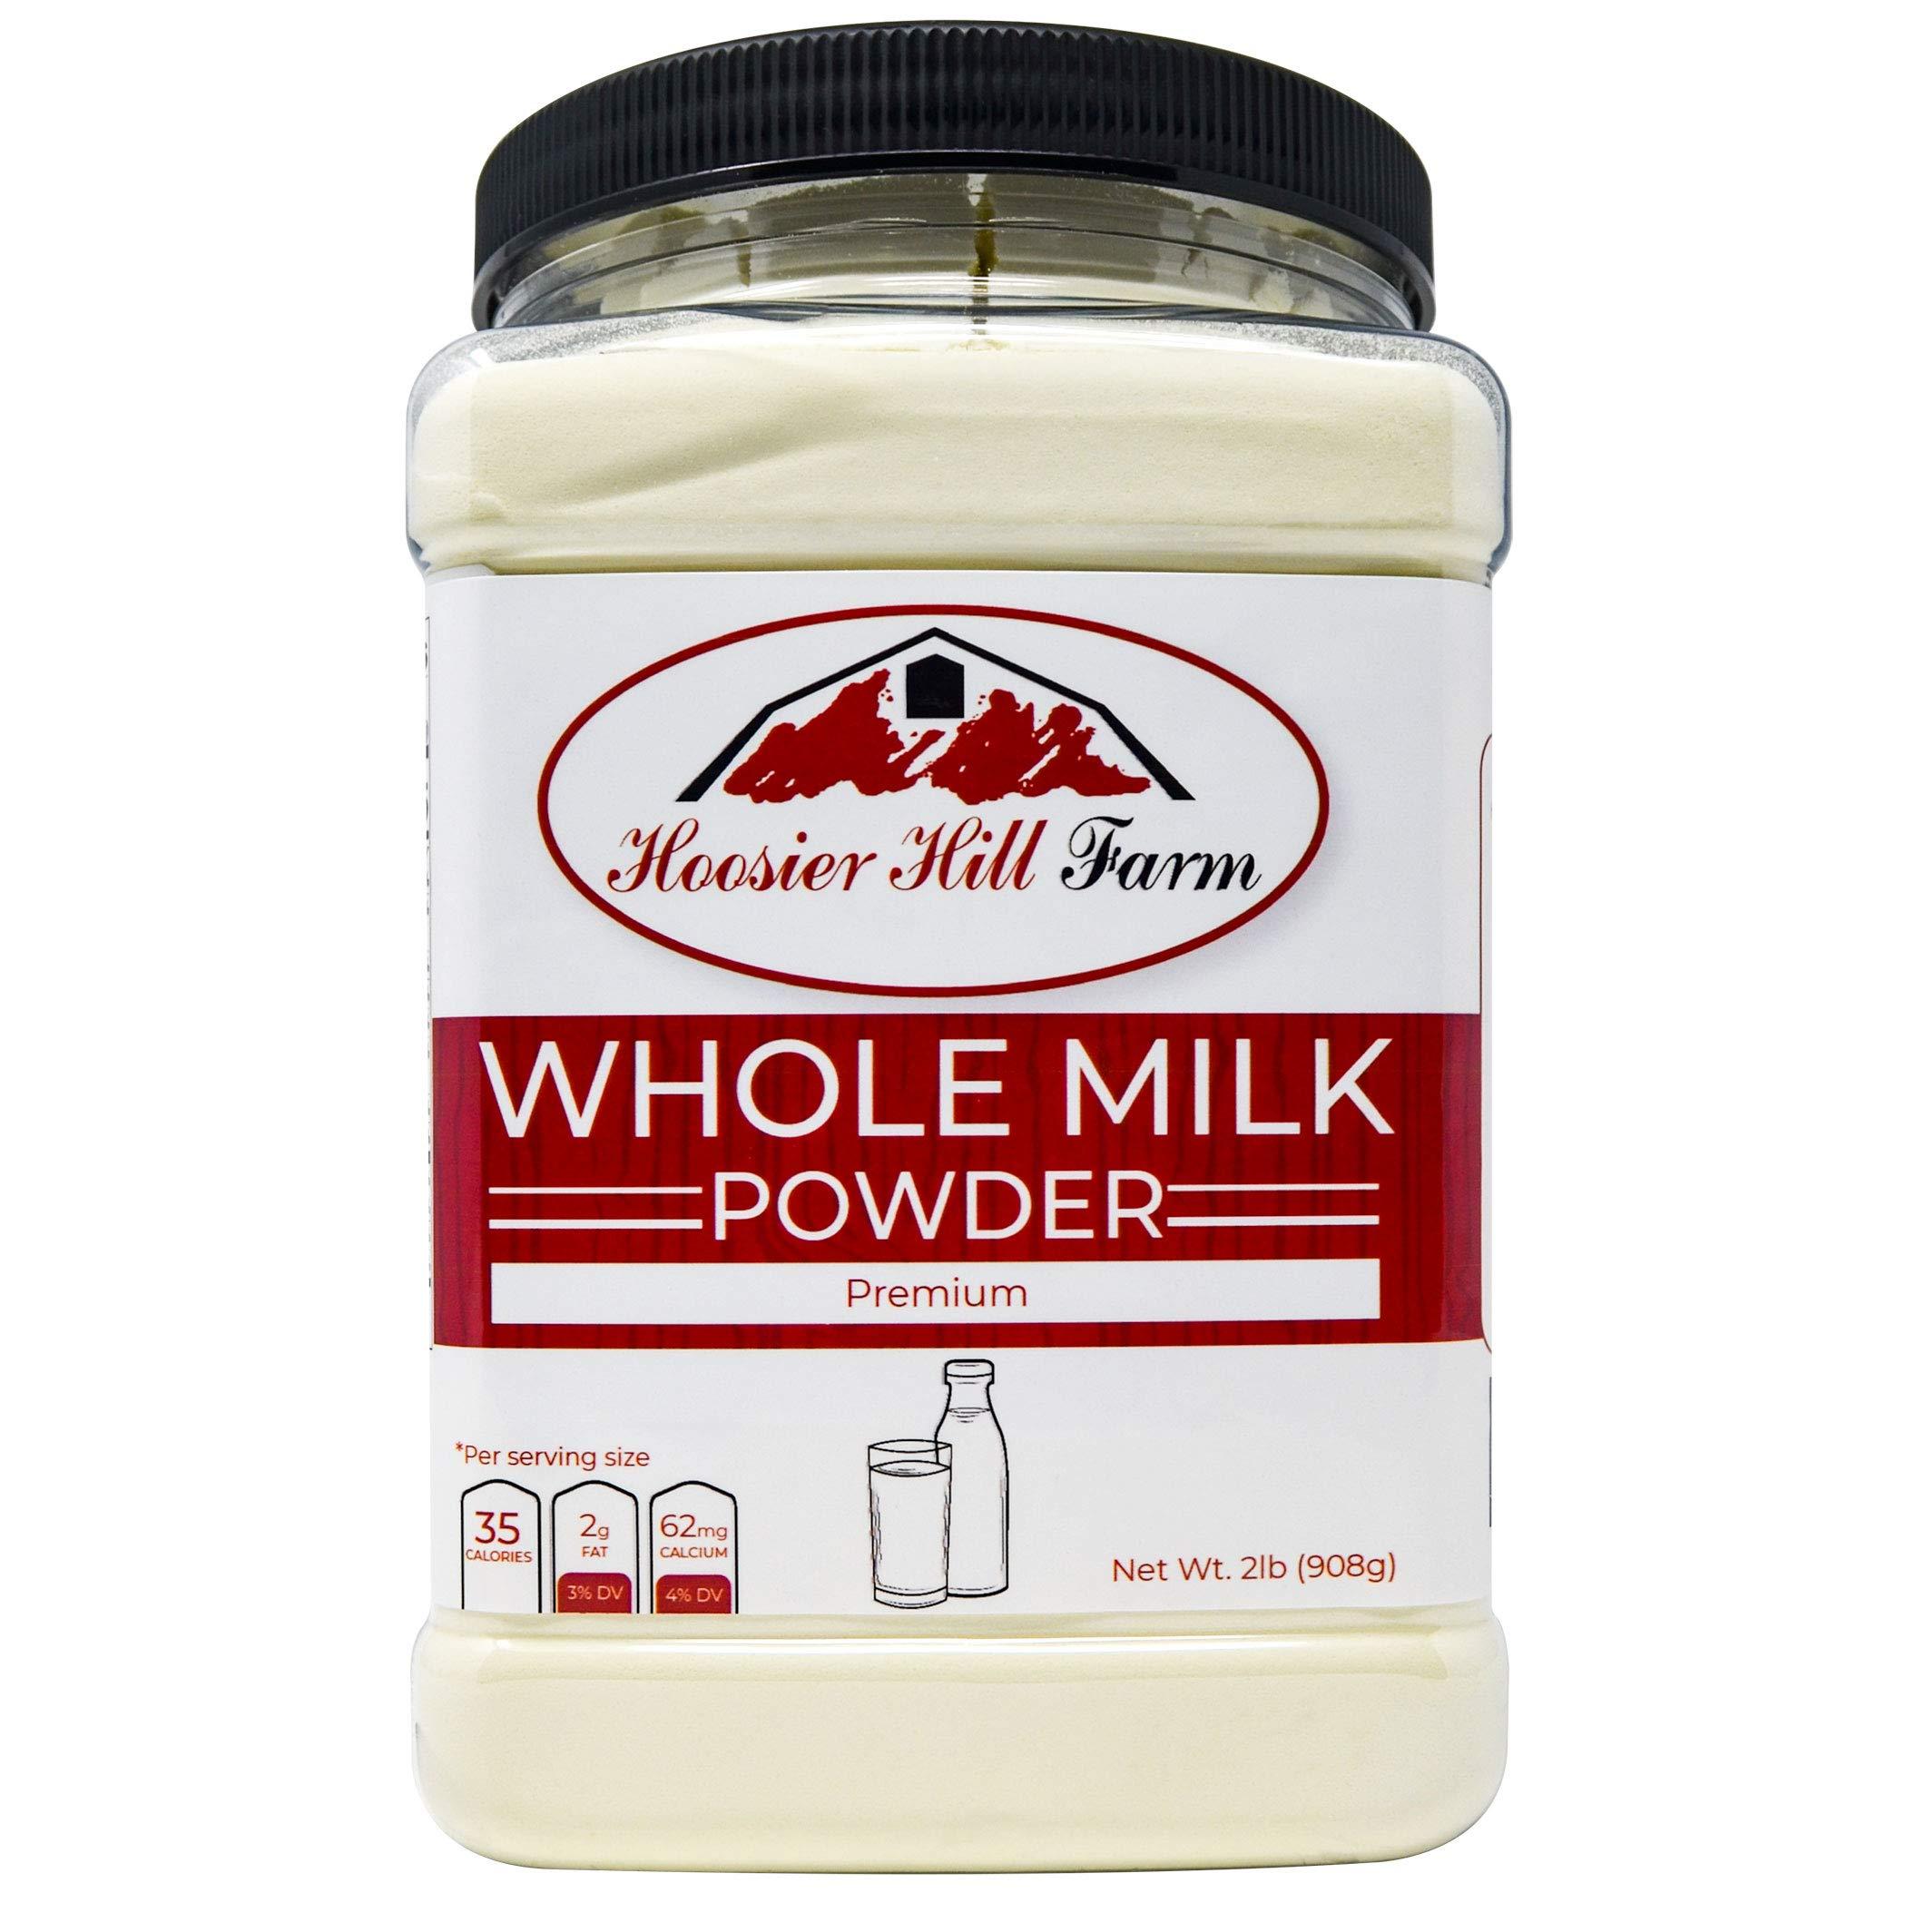 Hoosier Hill All American Whole Milk Powder 2 LBS, Hormone Free, Made in USA by Hoosier Hill Farm